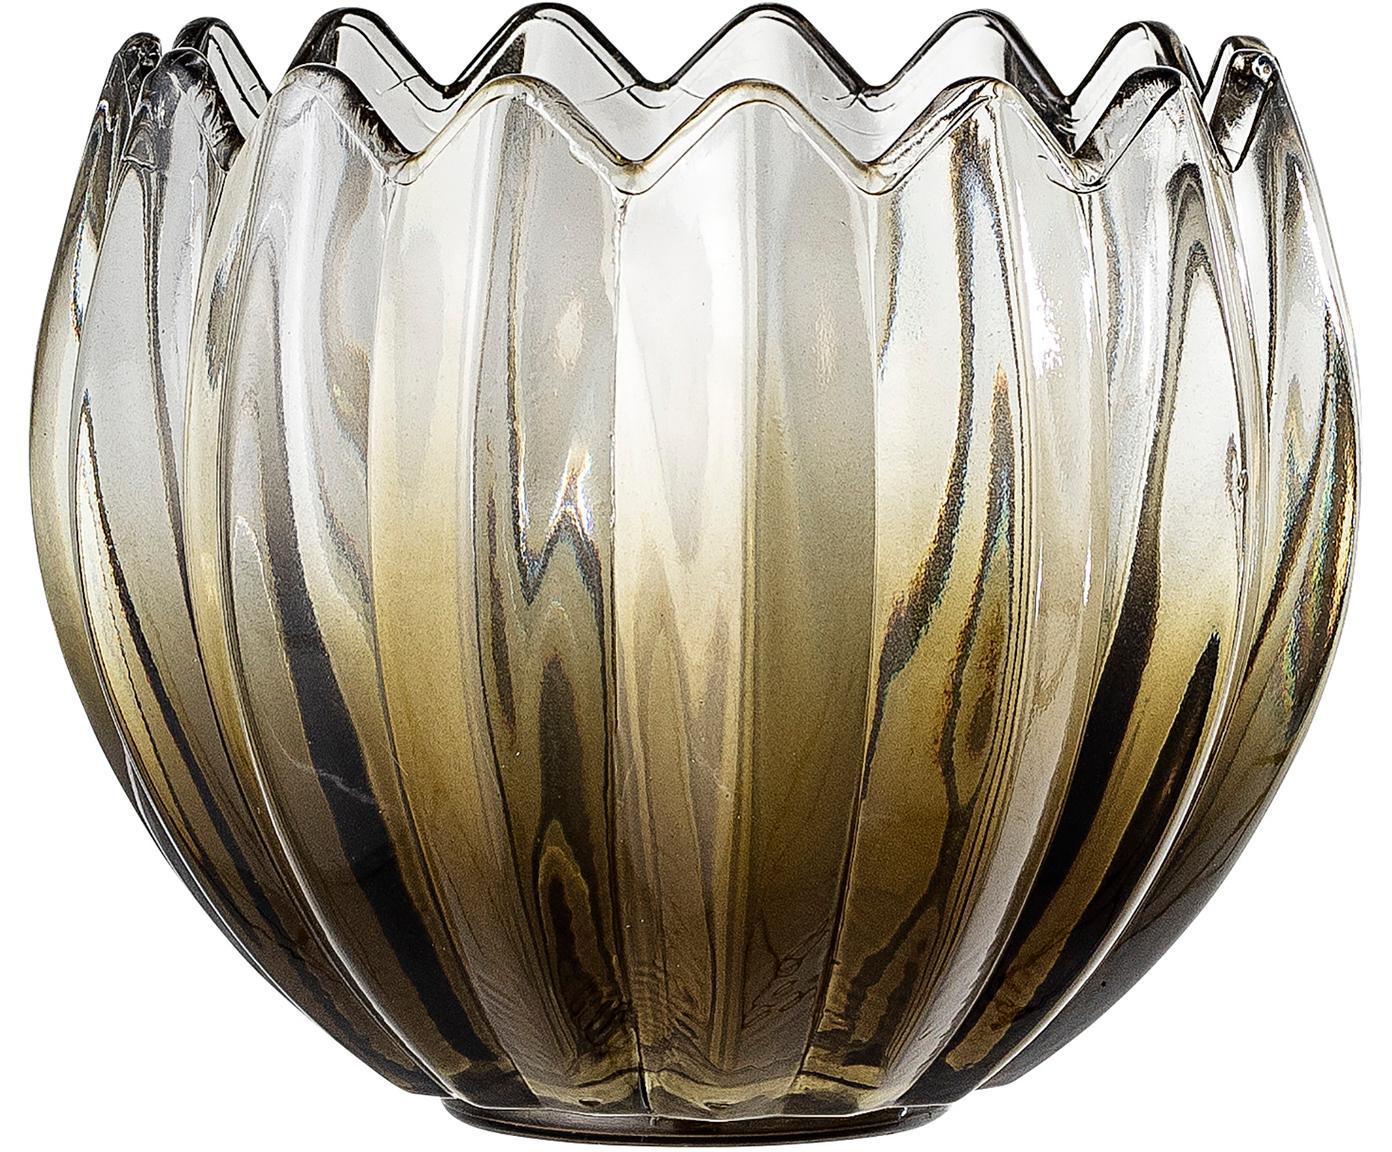 Windlicht Viva, Glas, Grün, transparent, Ø 13 x H 11 cm